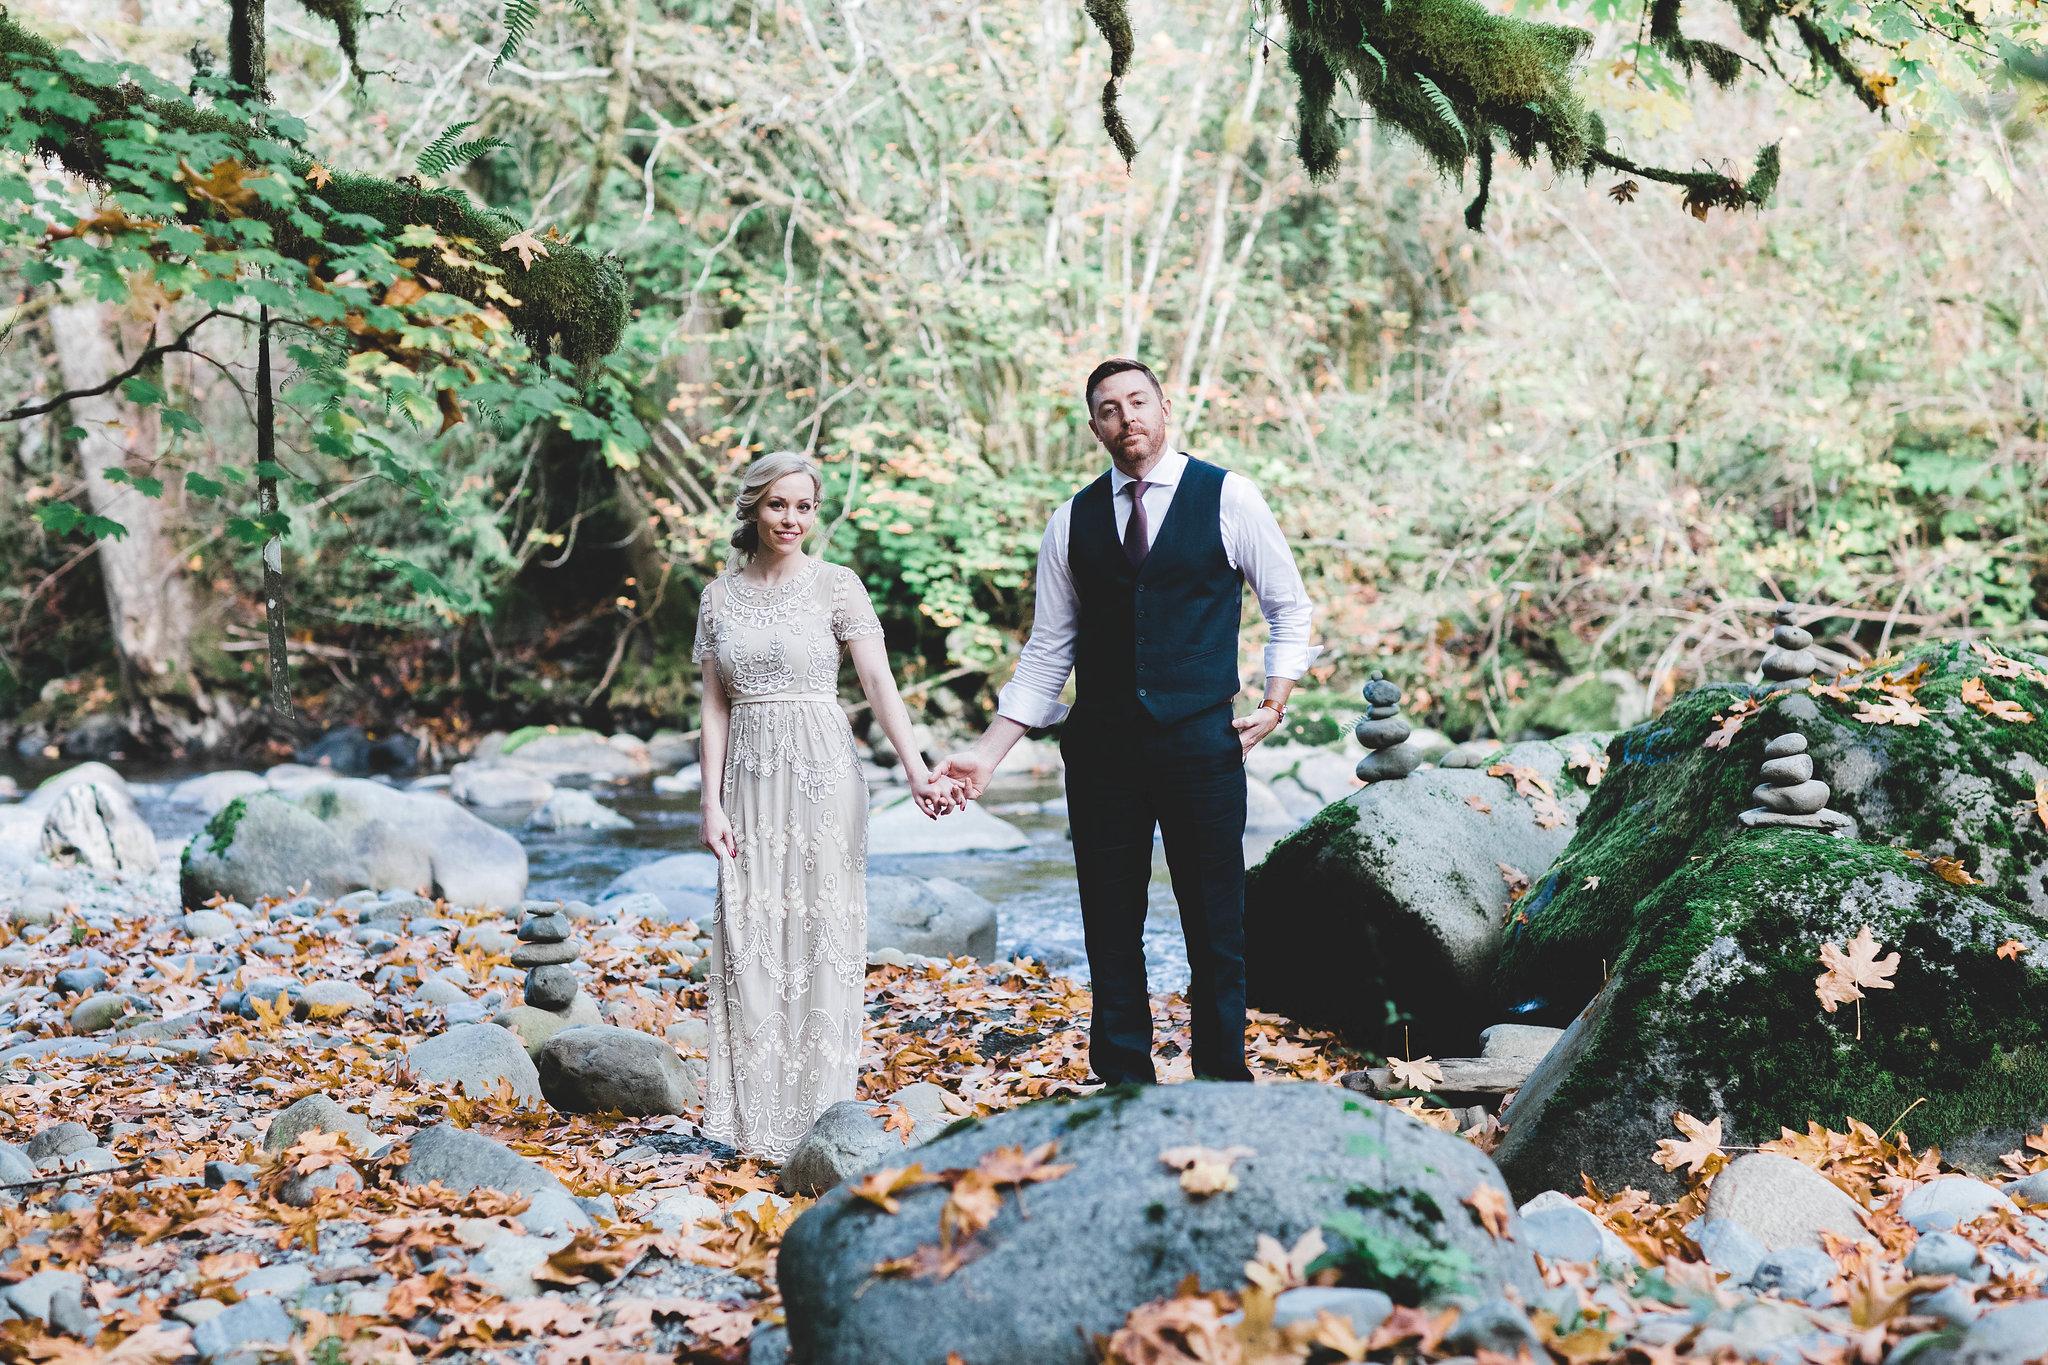 woodsy-treehouse-point-issaquah-elopement-Seattle-photographer-adina-preston-3.jpg